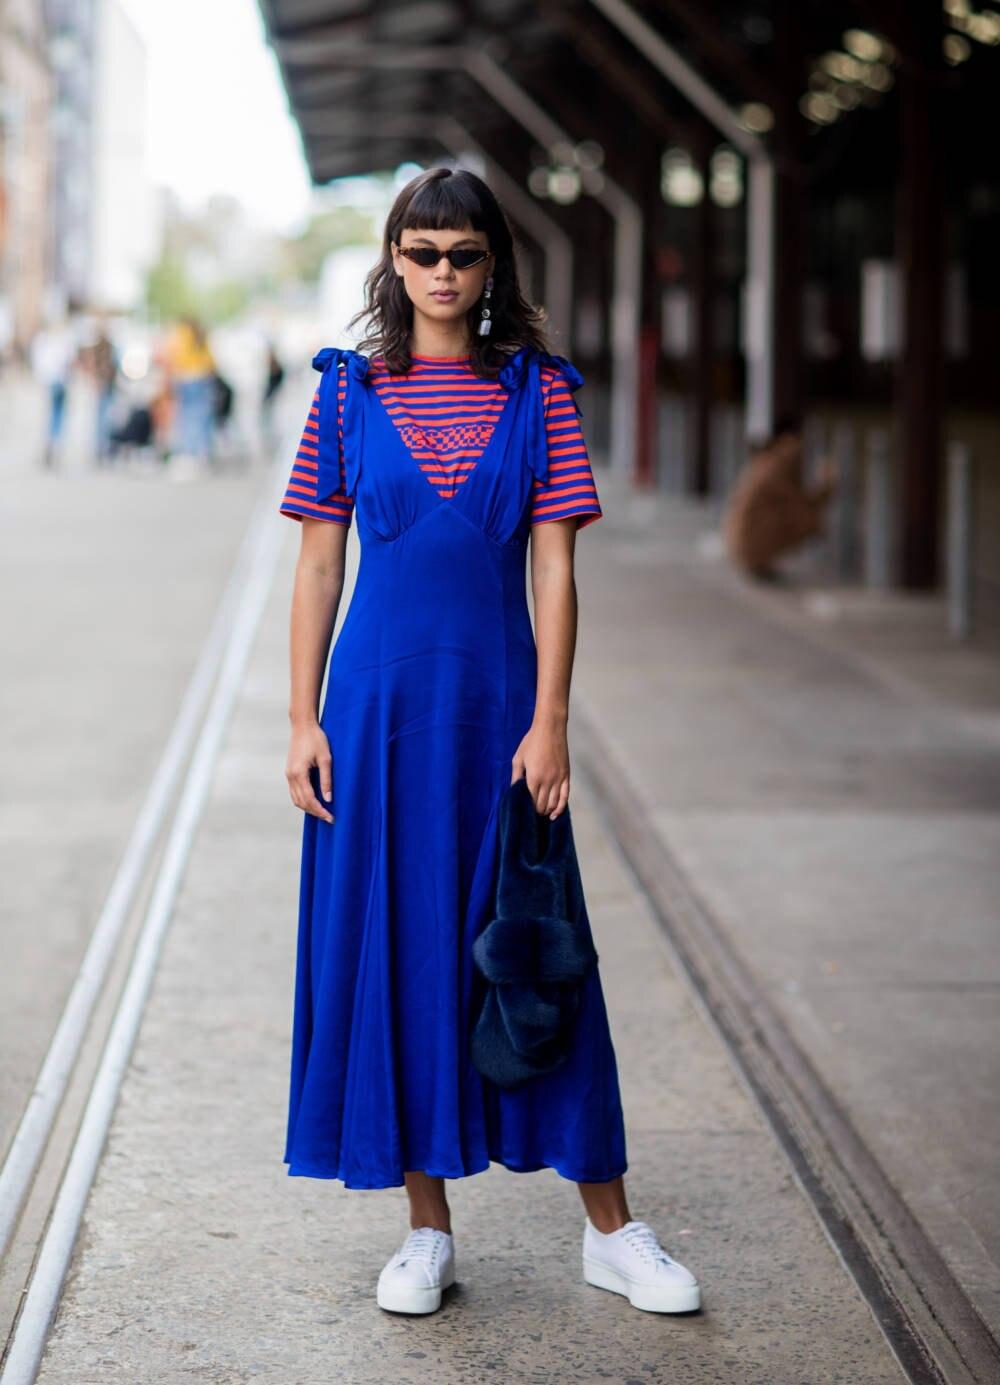 Frau trägt blaues langes Kleid mit T-Shirt darunter